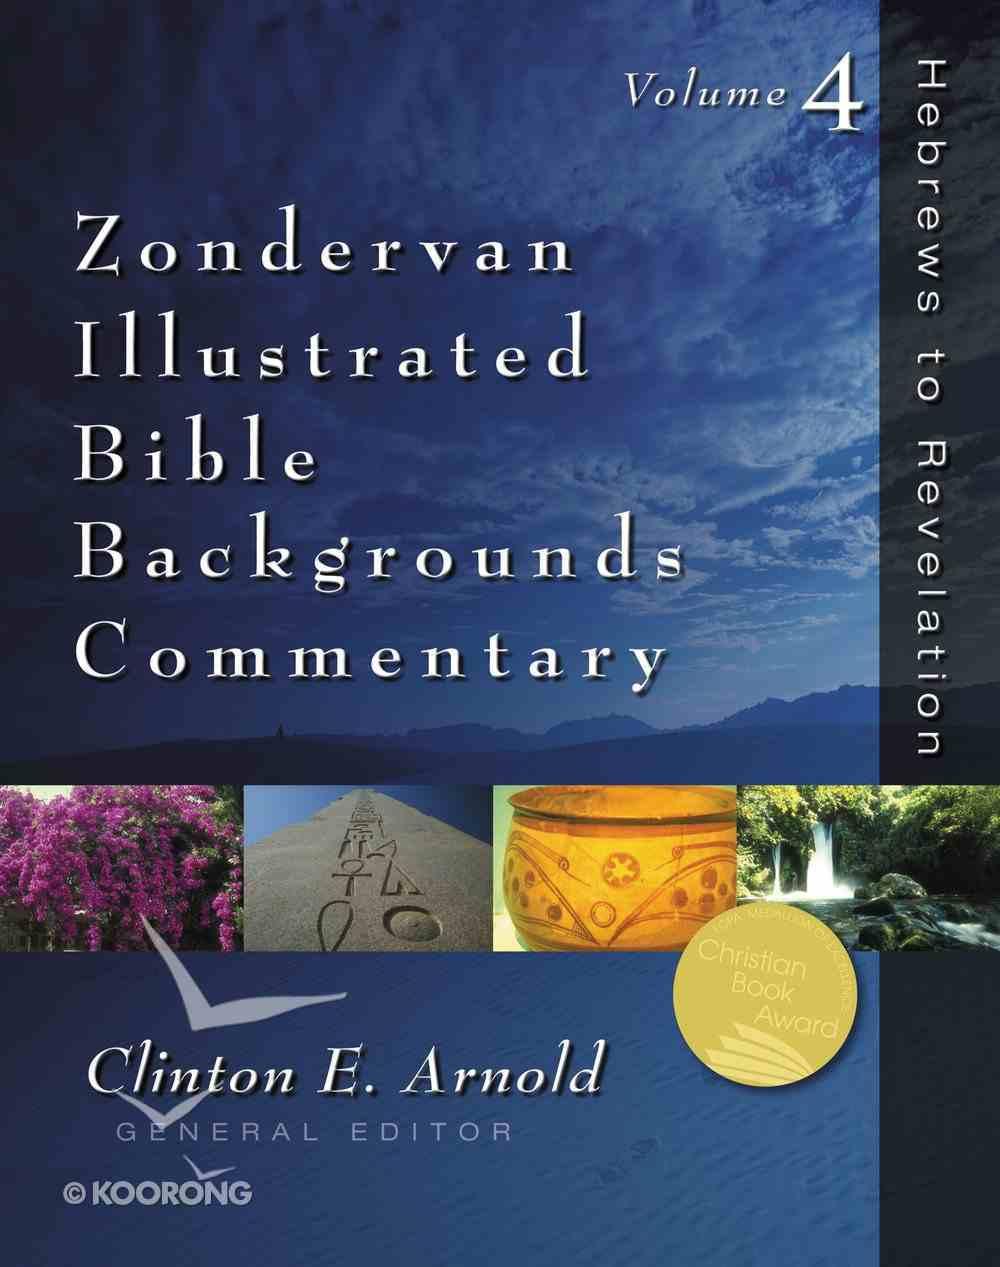 Hebrews-Revelation (Volume 4) (Zondervan Illustrated Bible Backgrounds Commentary Series) eBook